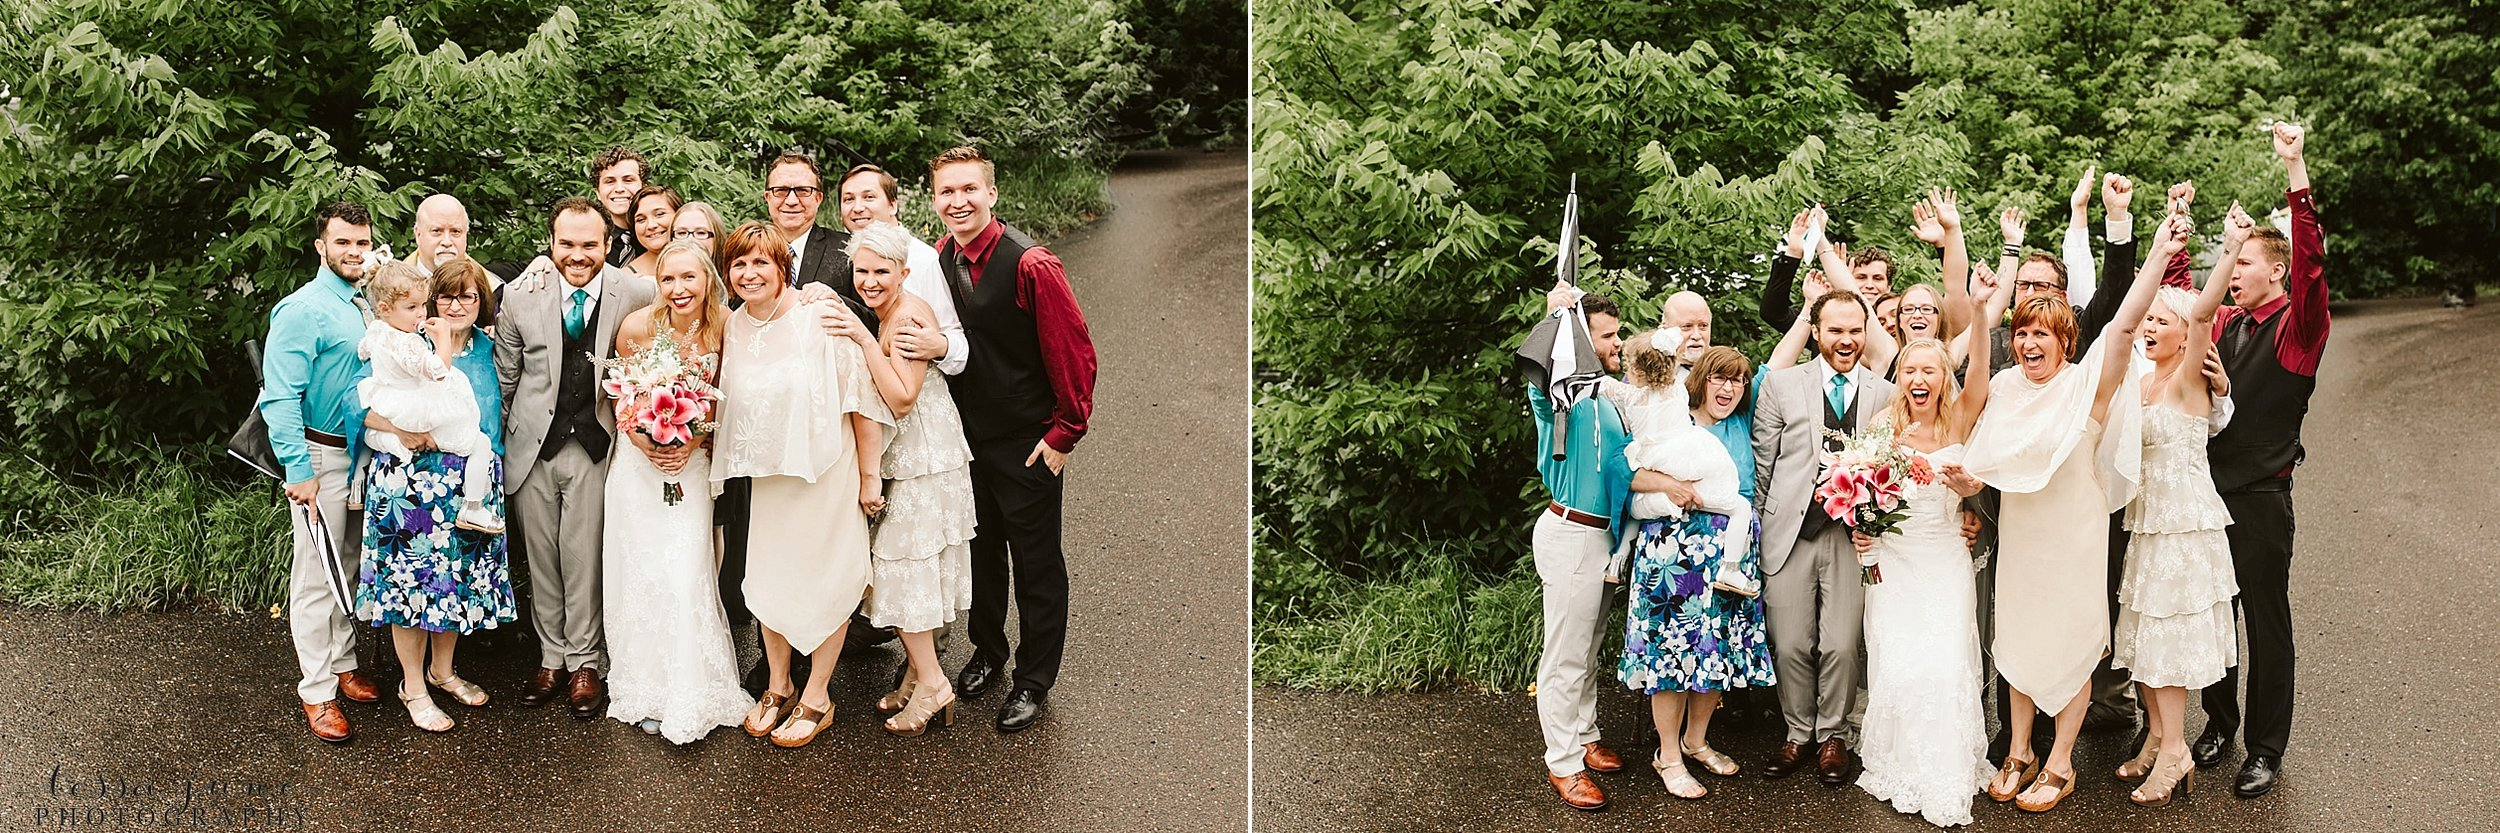 taylors-falls-rainy-elopement-wedding-interstate-state-park-74.jpg